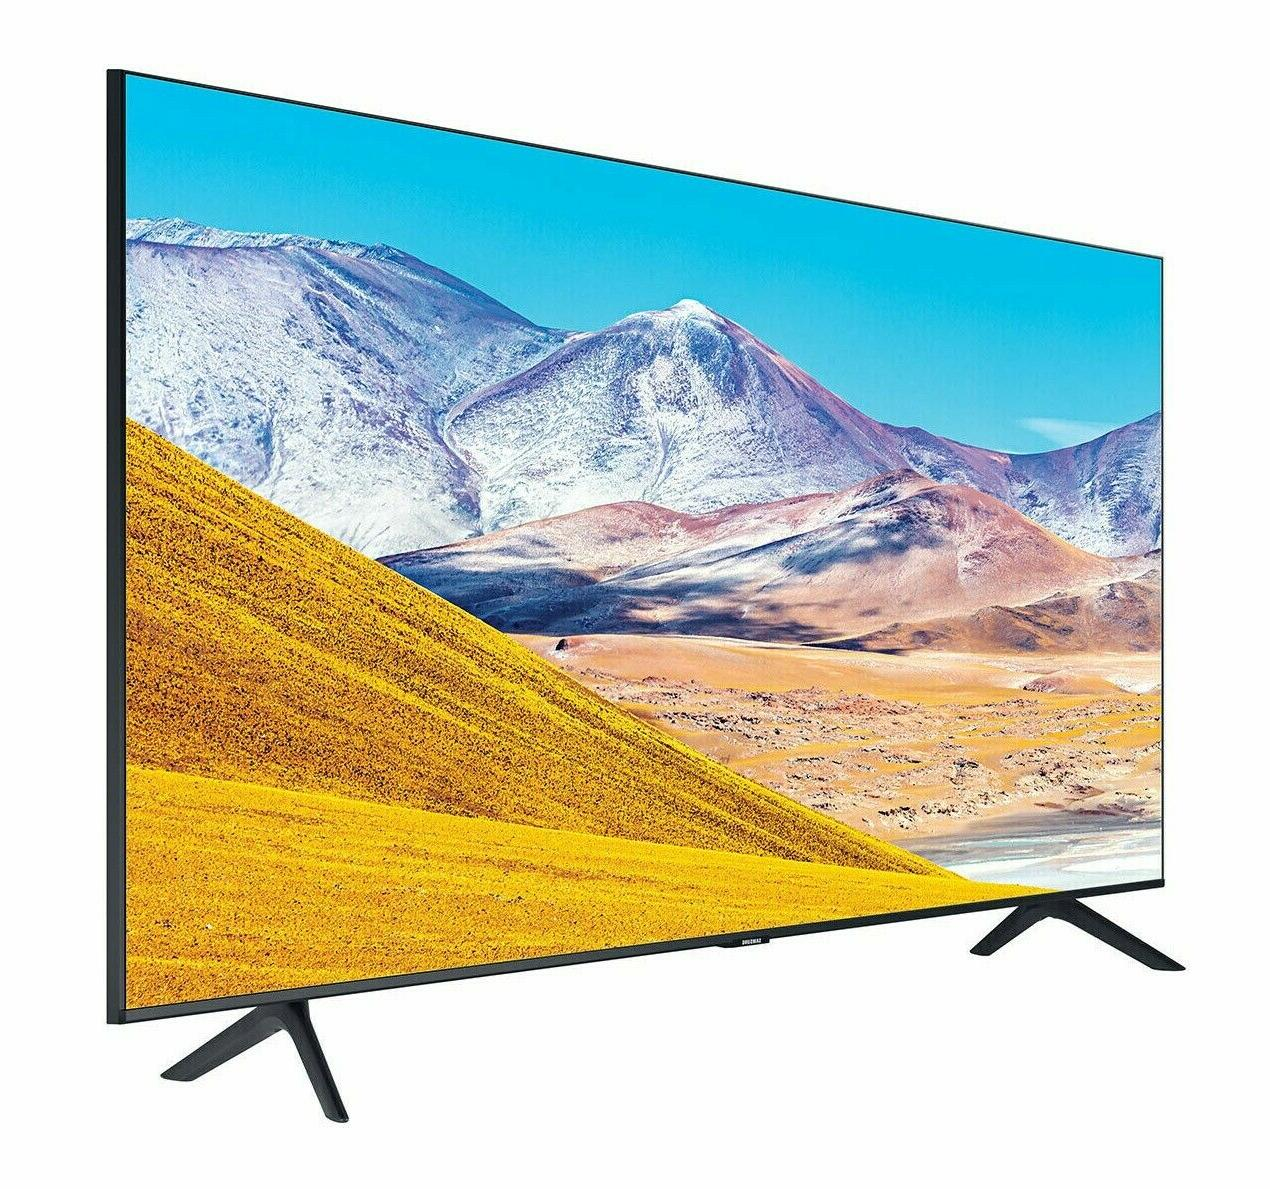 Samsung Crystal HD Smart TV - 2020 Model